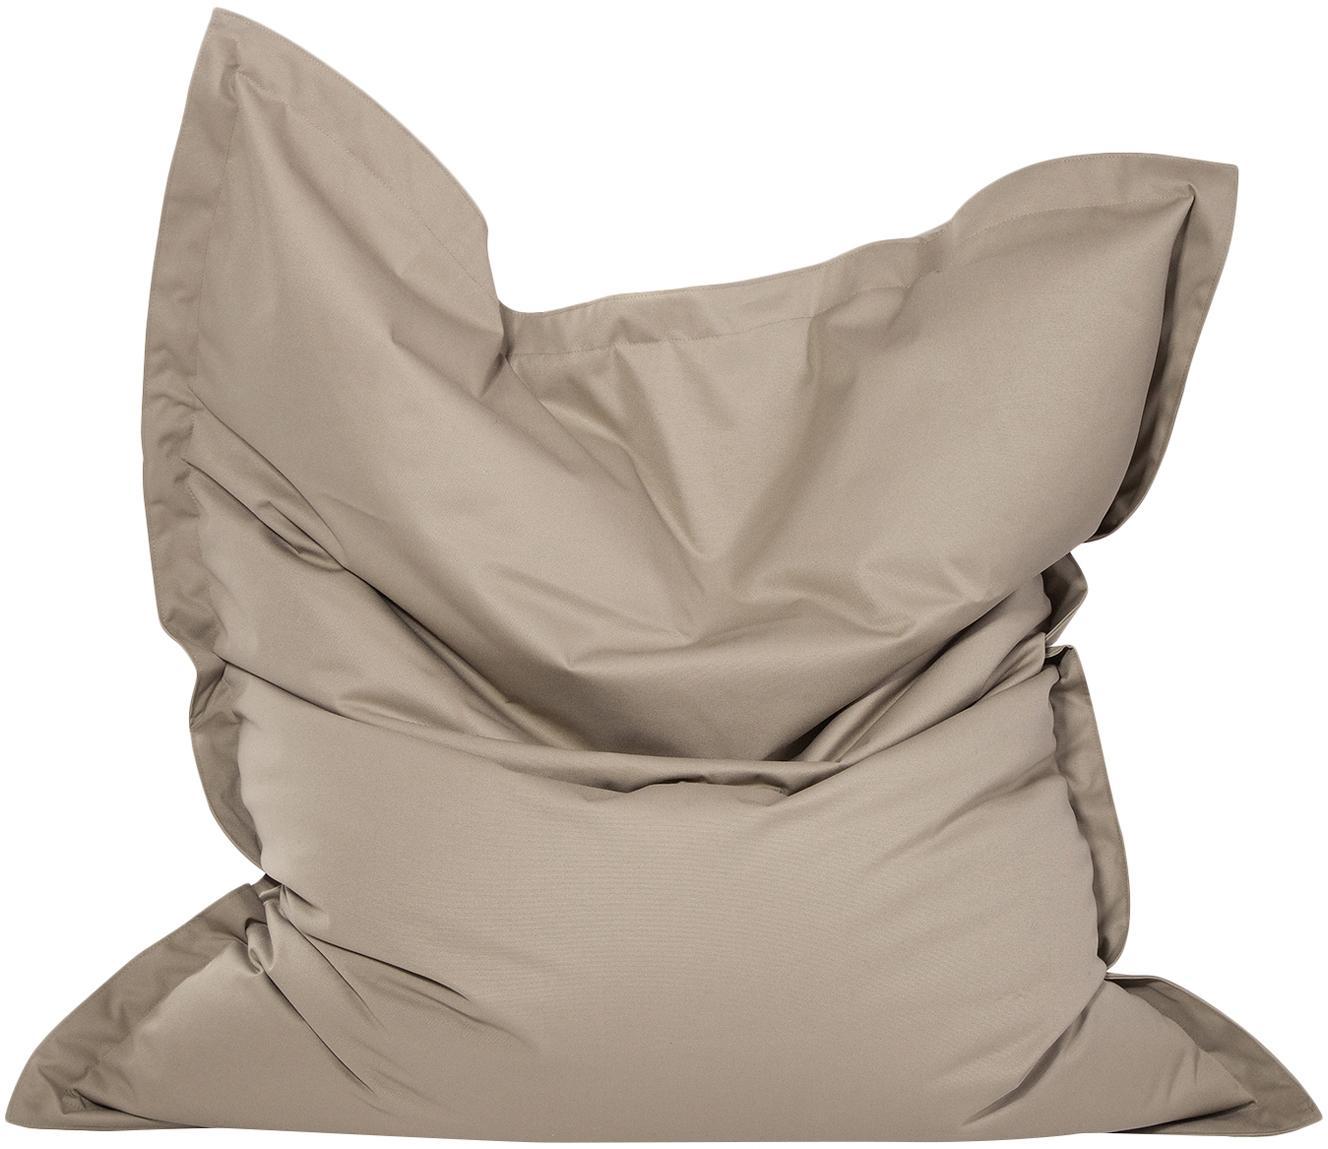 Grote zitzak Meadow, Bekleding: polyester, polyurethaan g, Moddergrijs, 130 x 160 cm